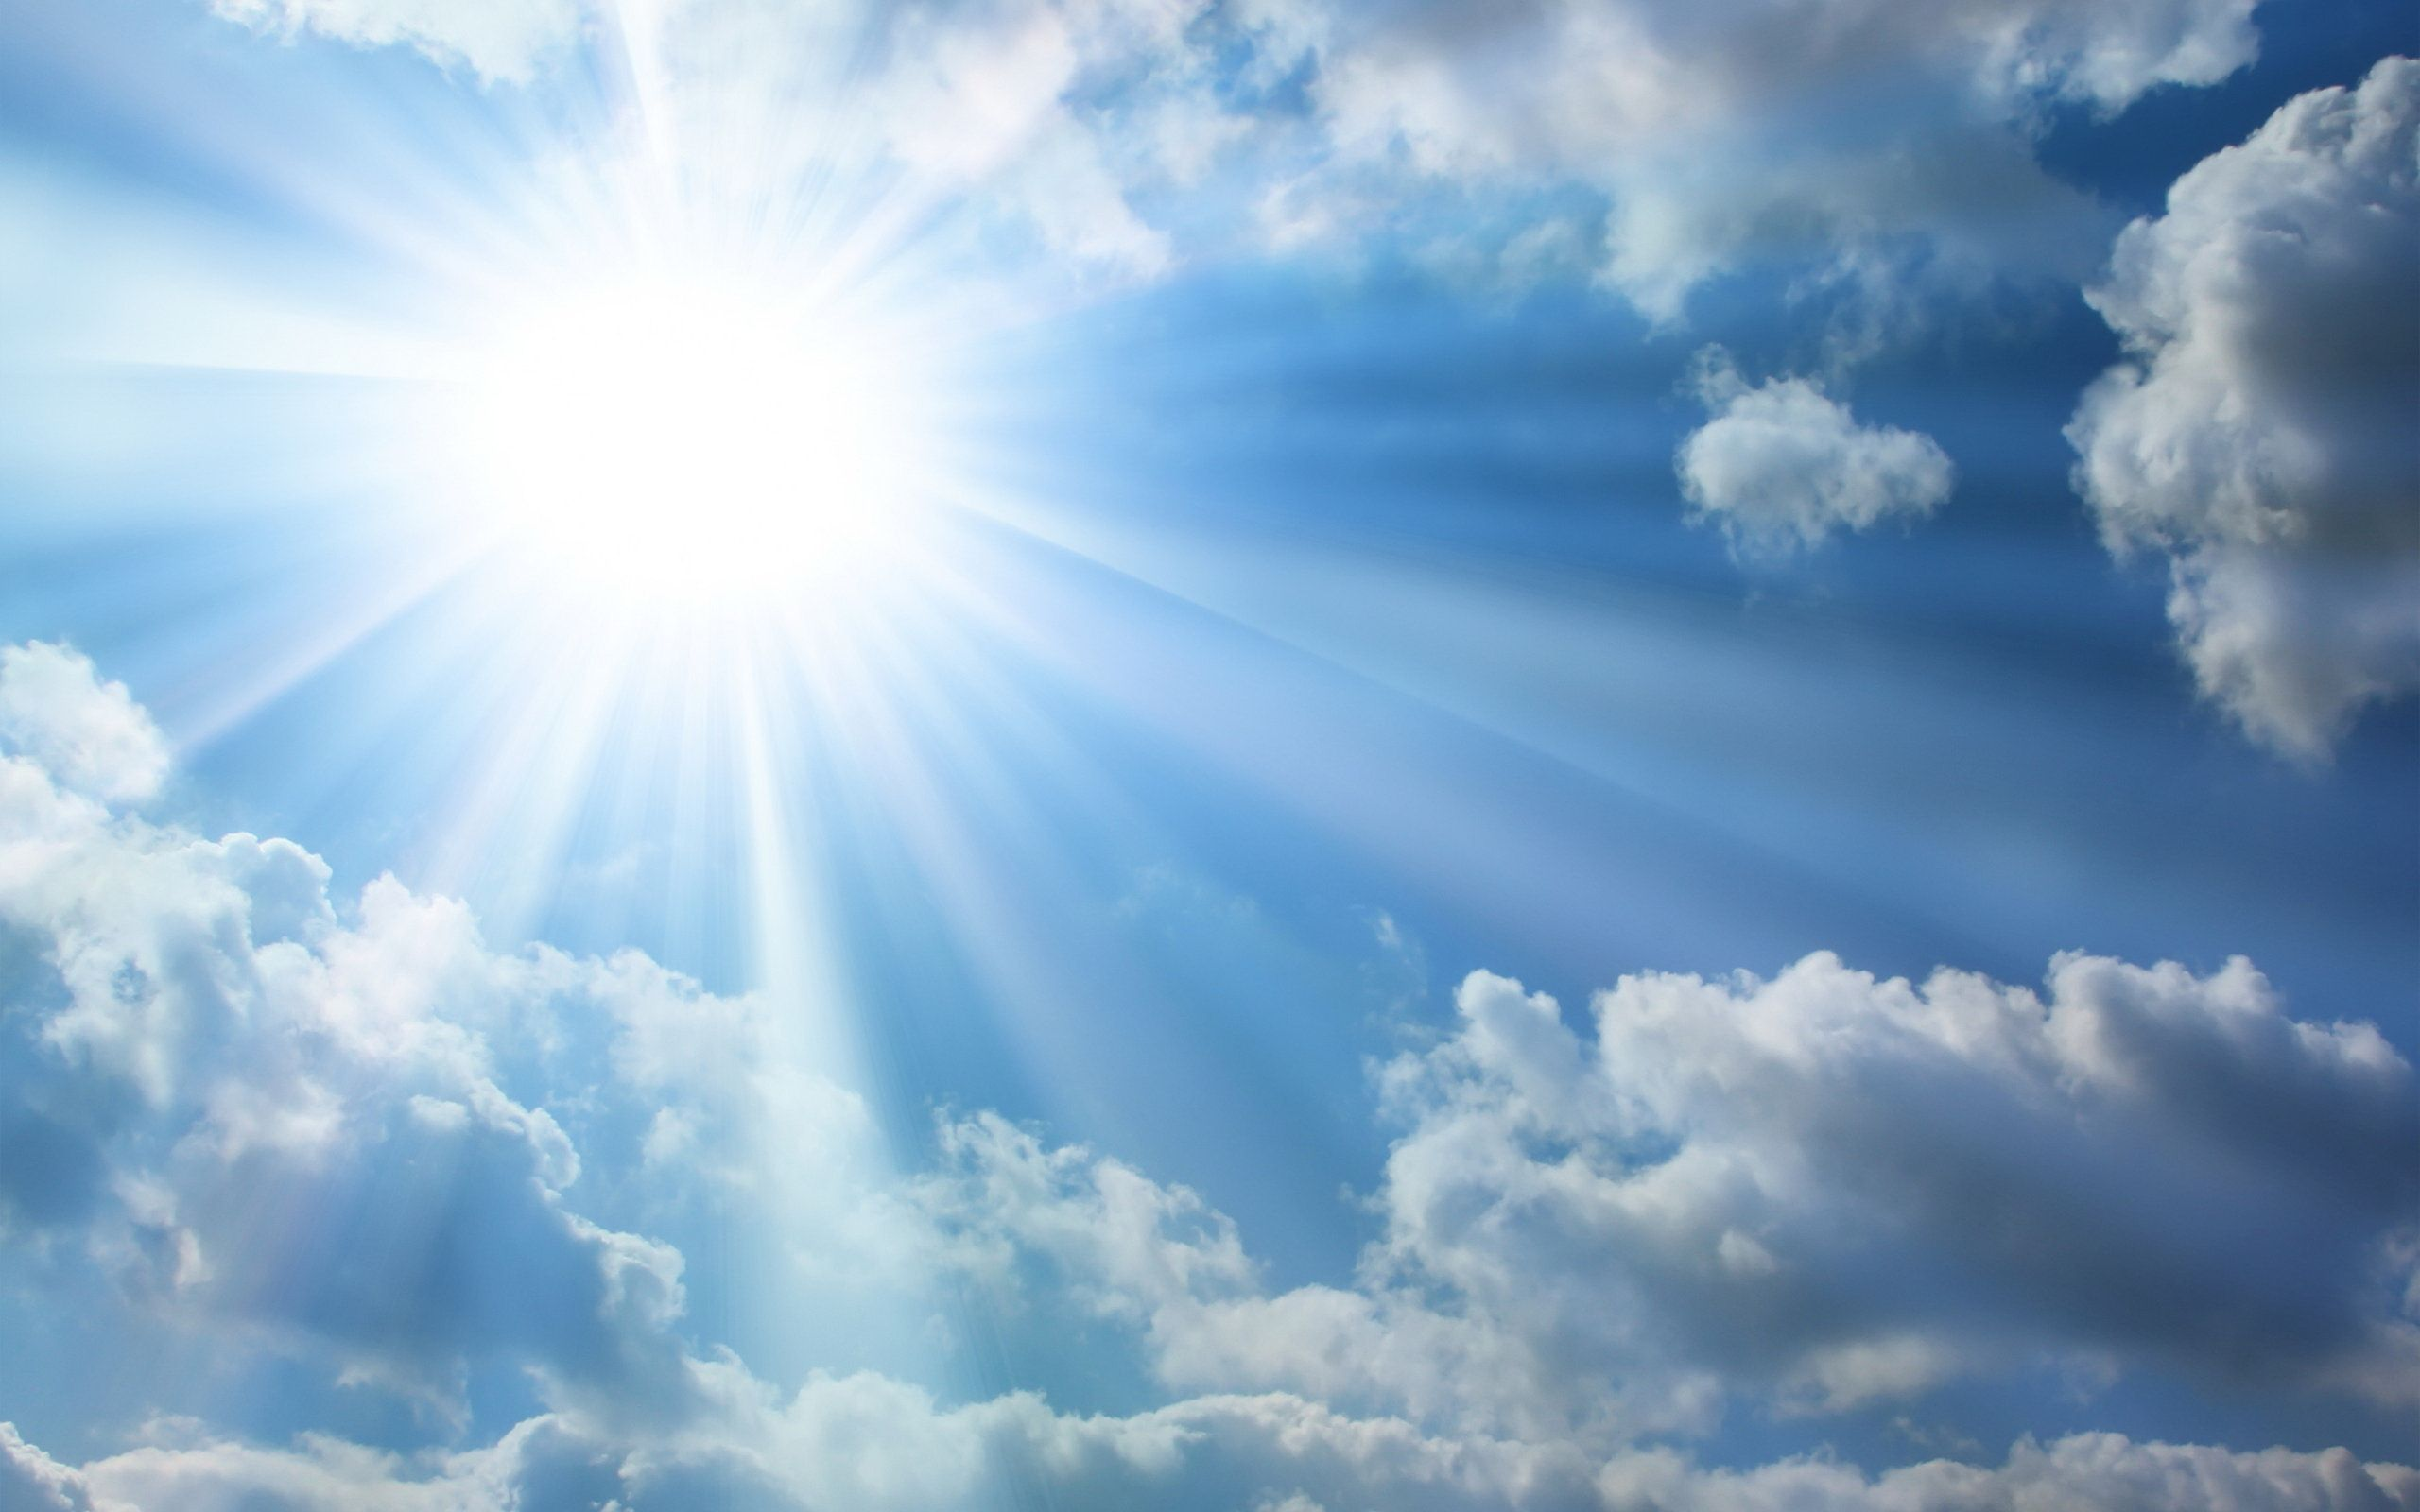 Sun Sky Wallpapers Top Free Sun Sky Backgrounds Wallpaperaccess